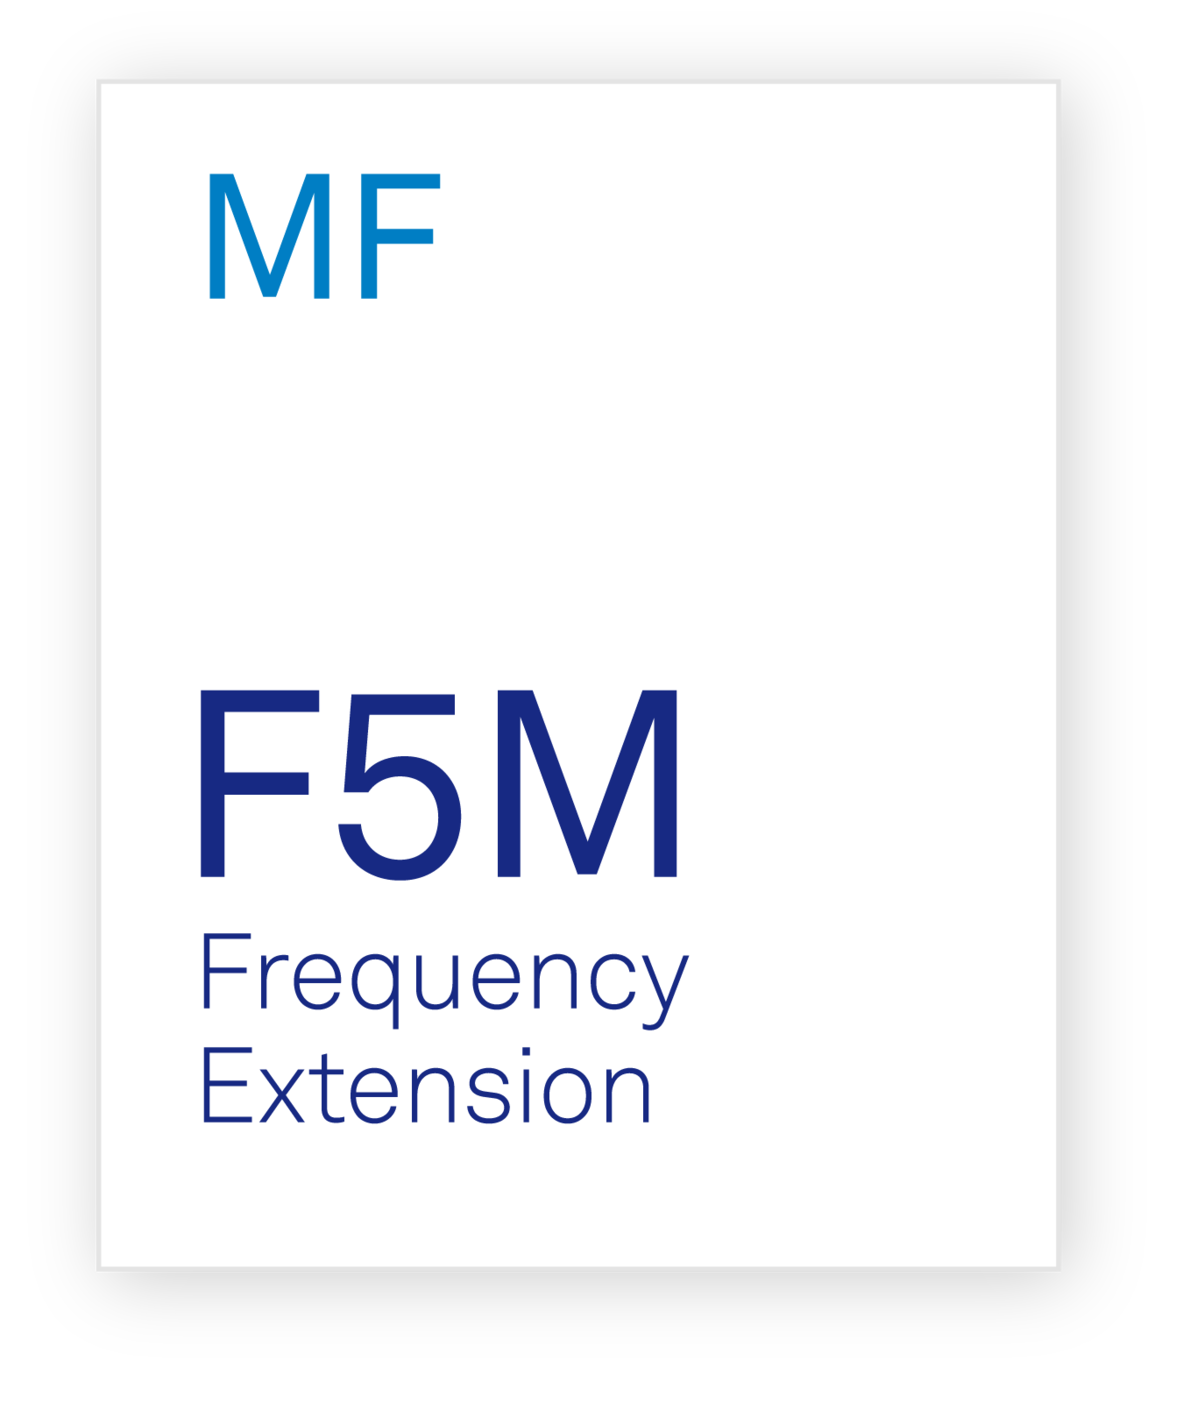 Zurich Instruments MF F5M Frequency Extension